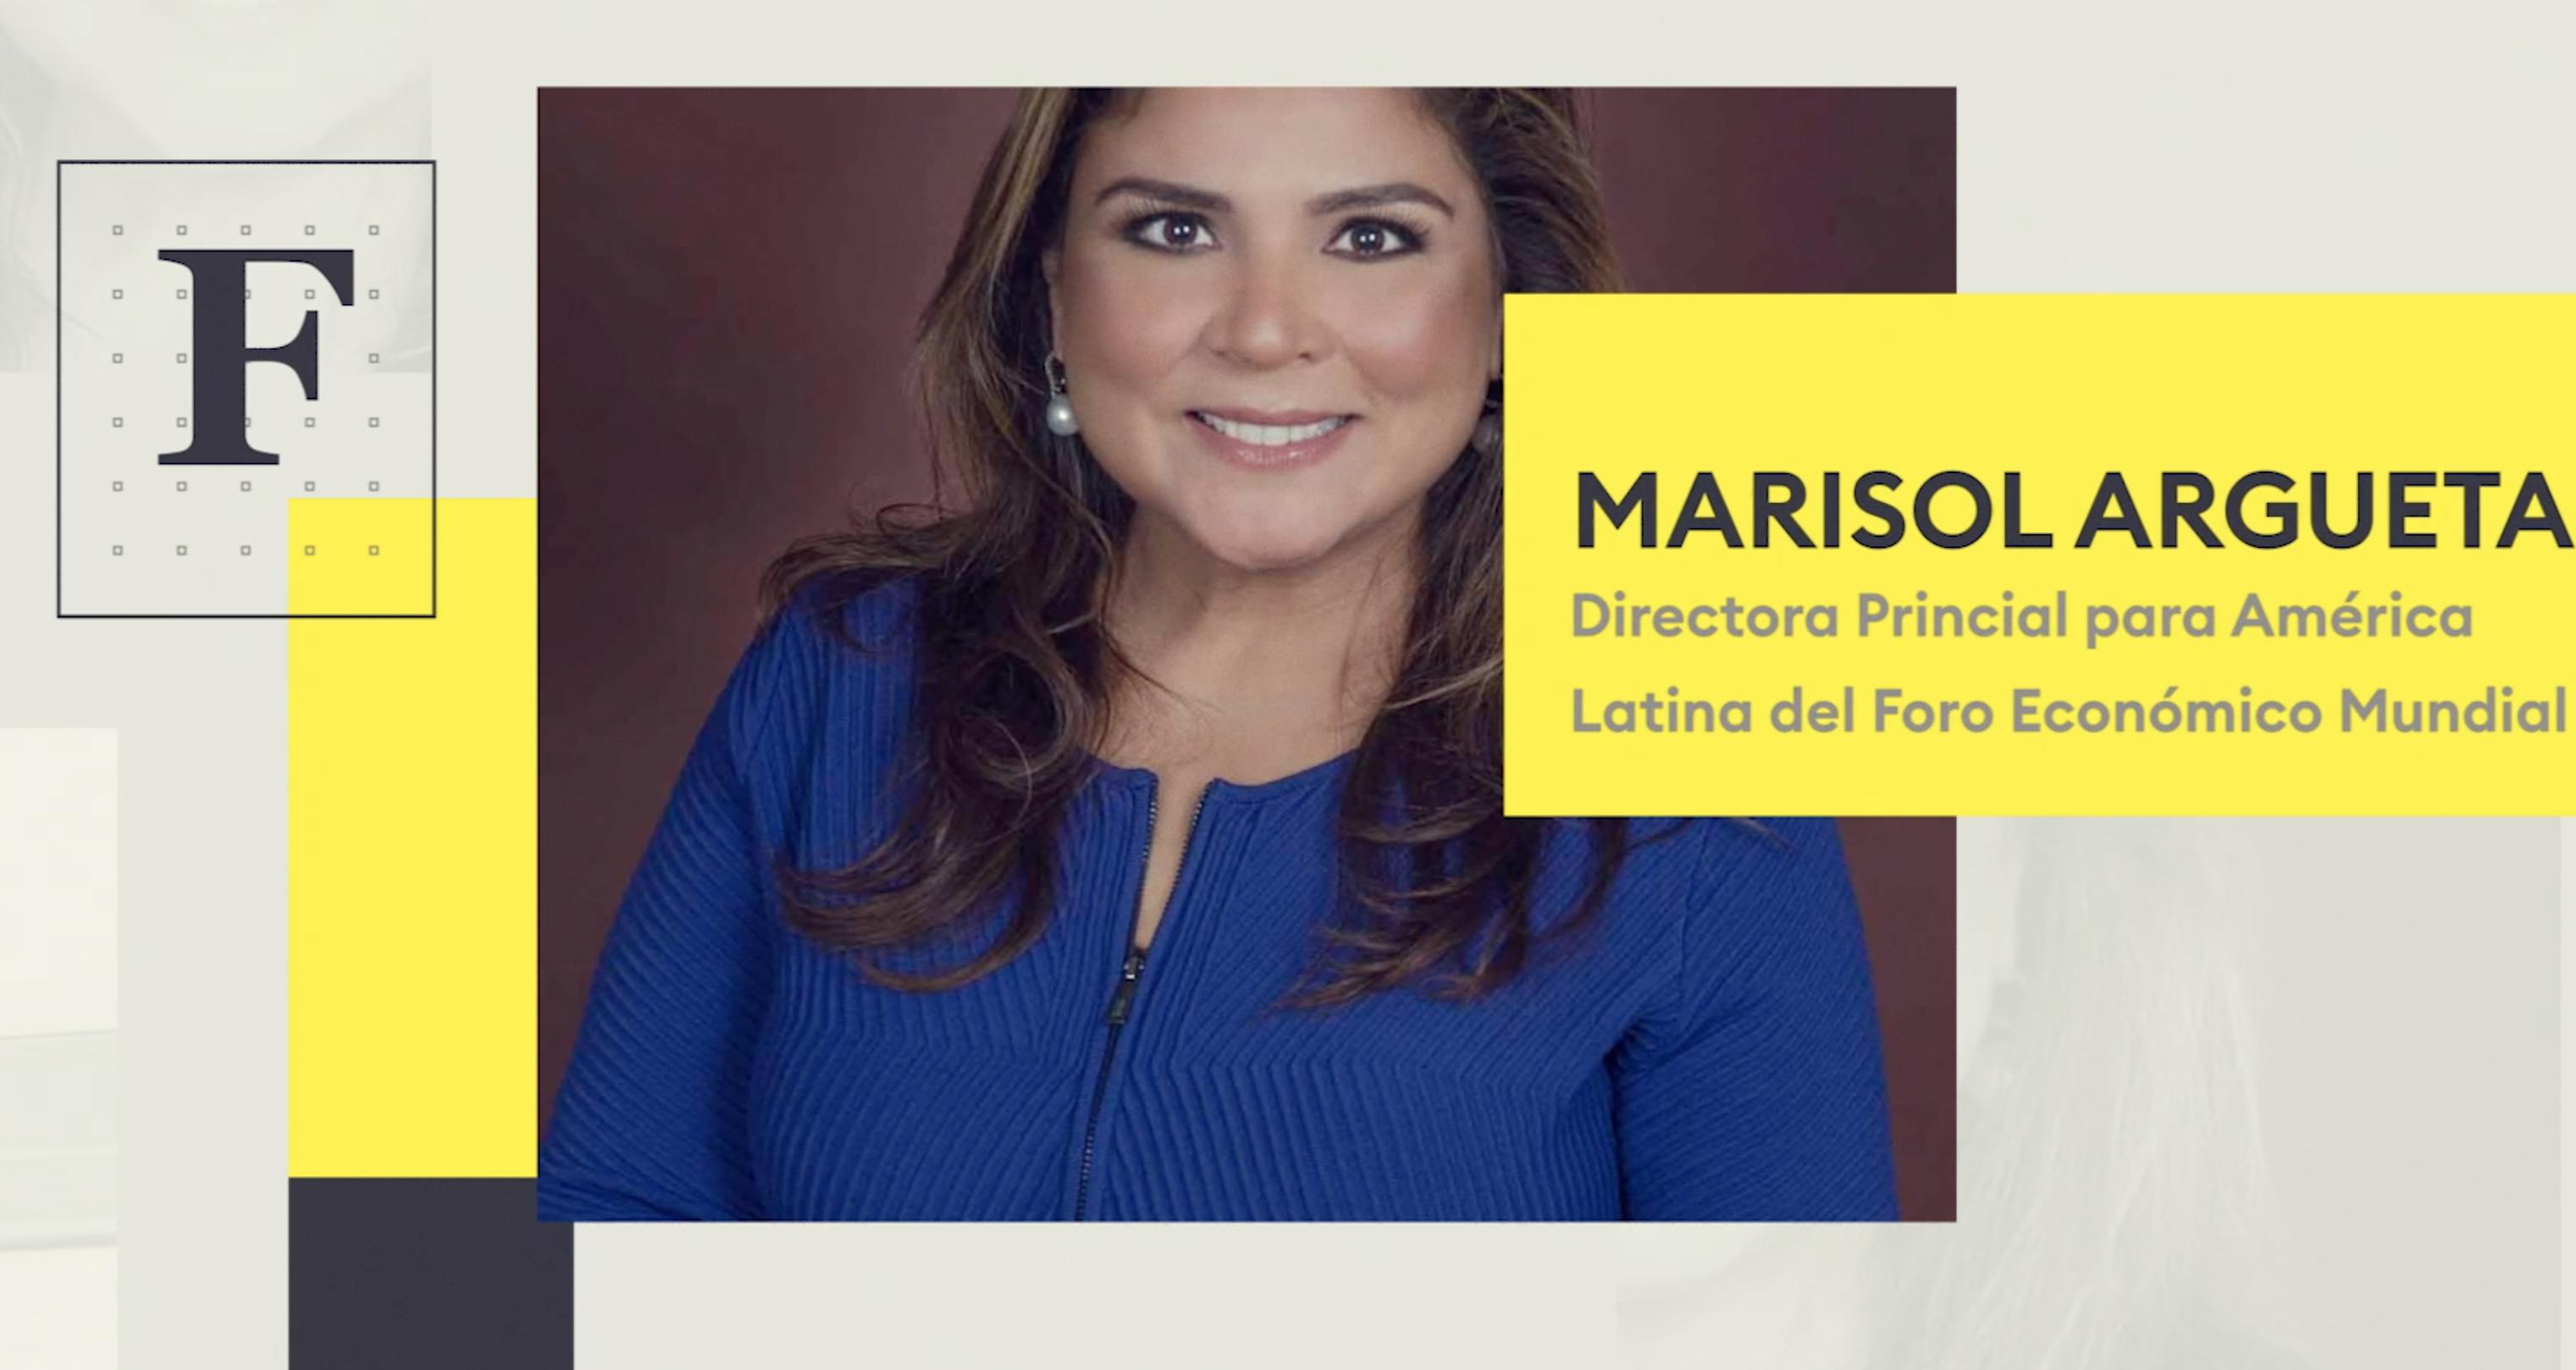 Mujeres Poderosas: Marisol Argueta